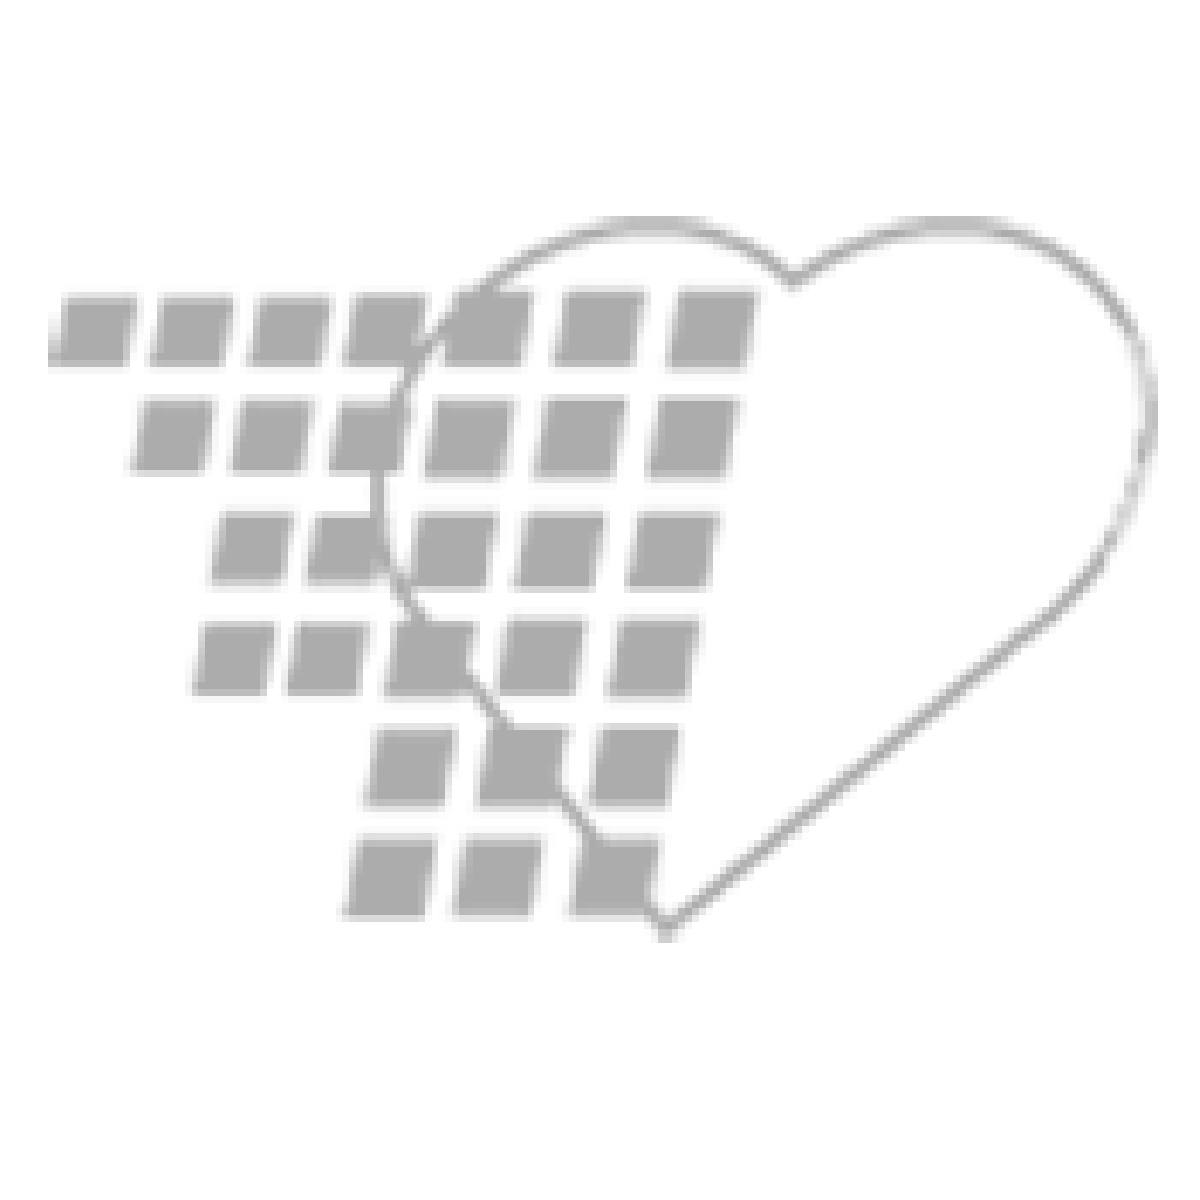 11-09-3900 - Nasco CRiSis   Manikin CD-ROM